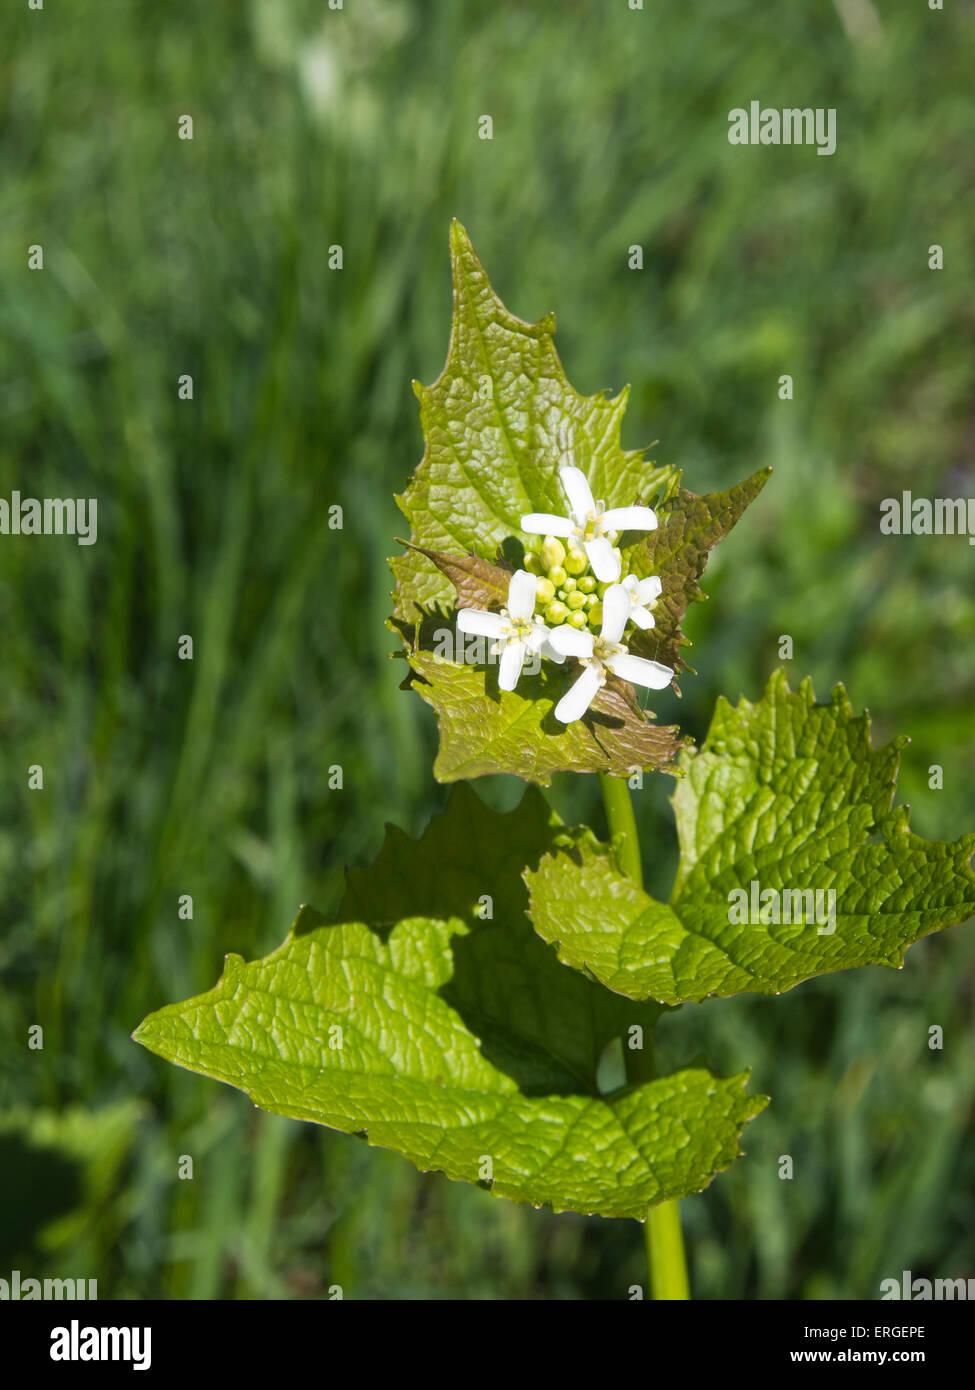 Close up of green foliage and white flowers, Alliaria petiolata, Garlic Mustard Stock Photo